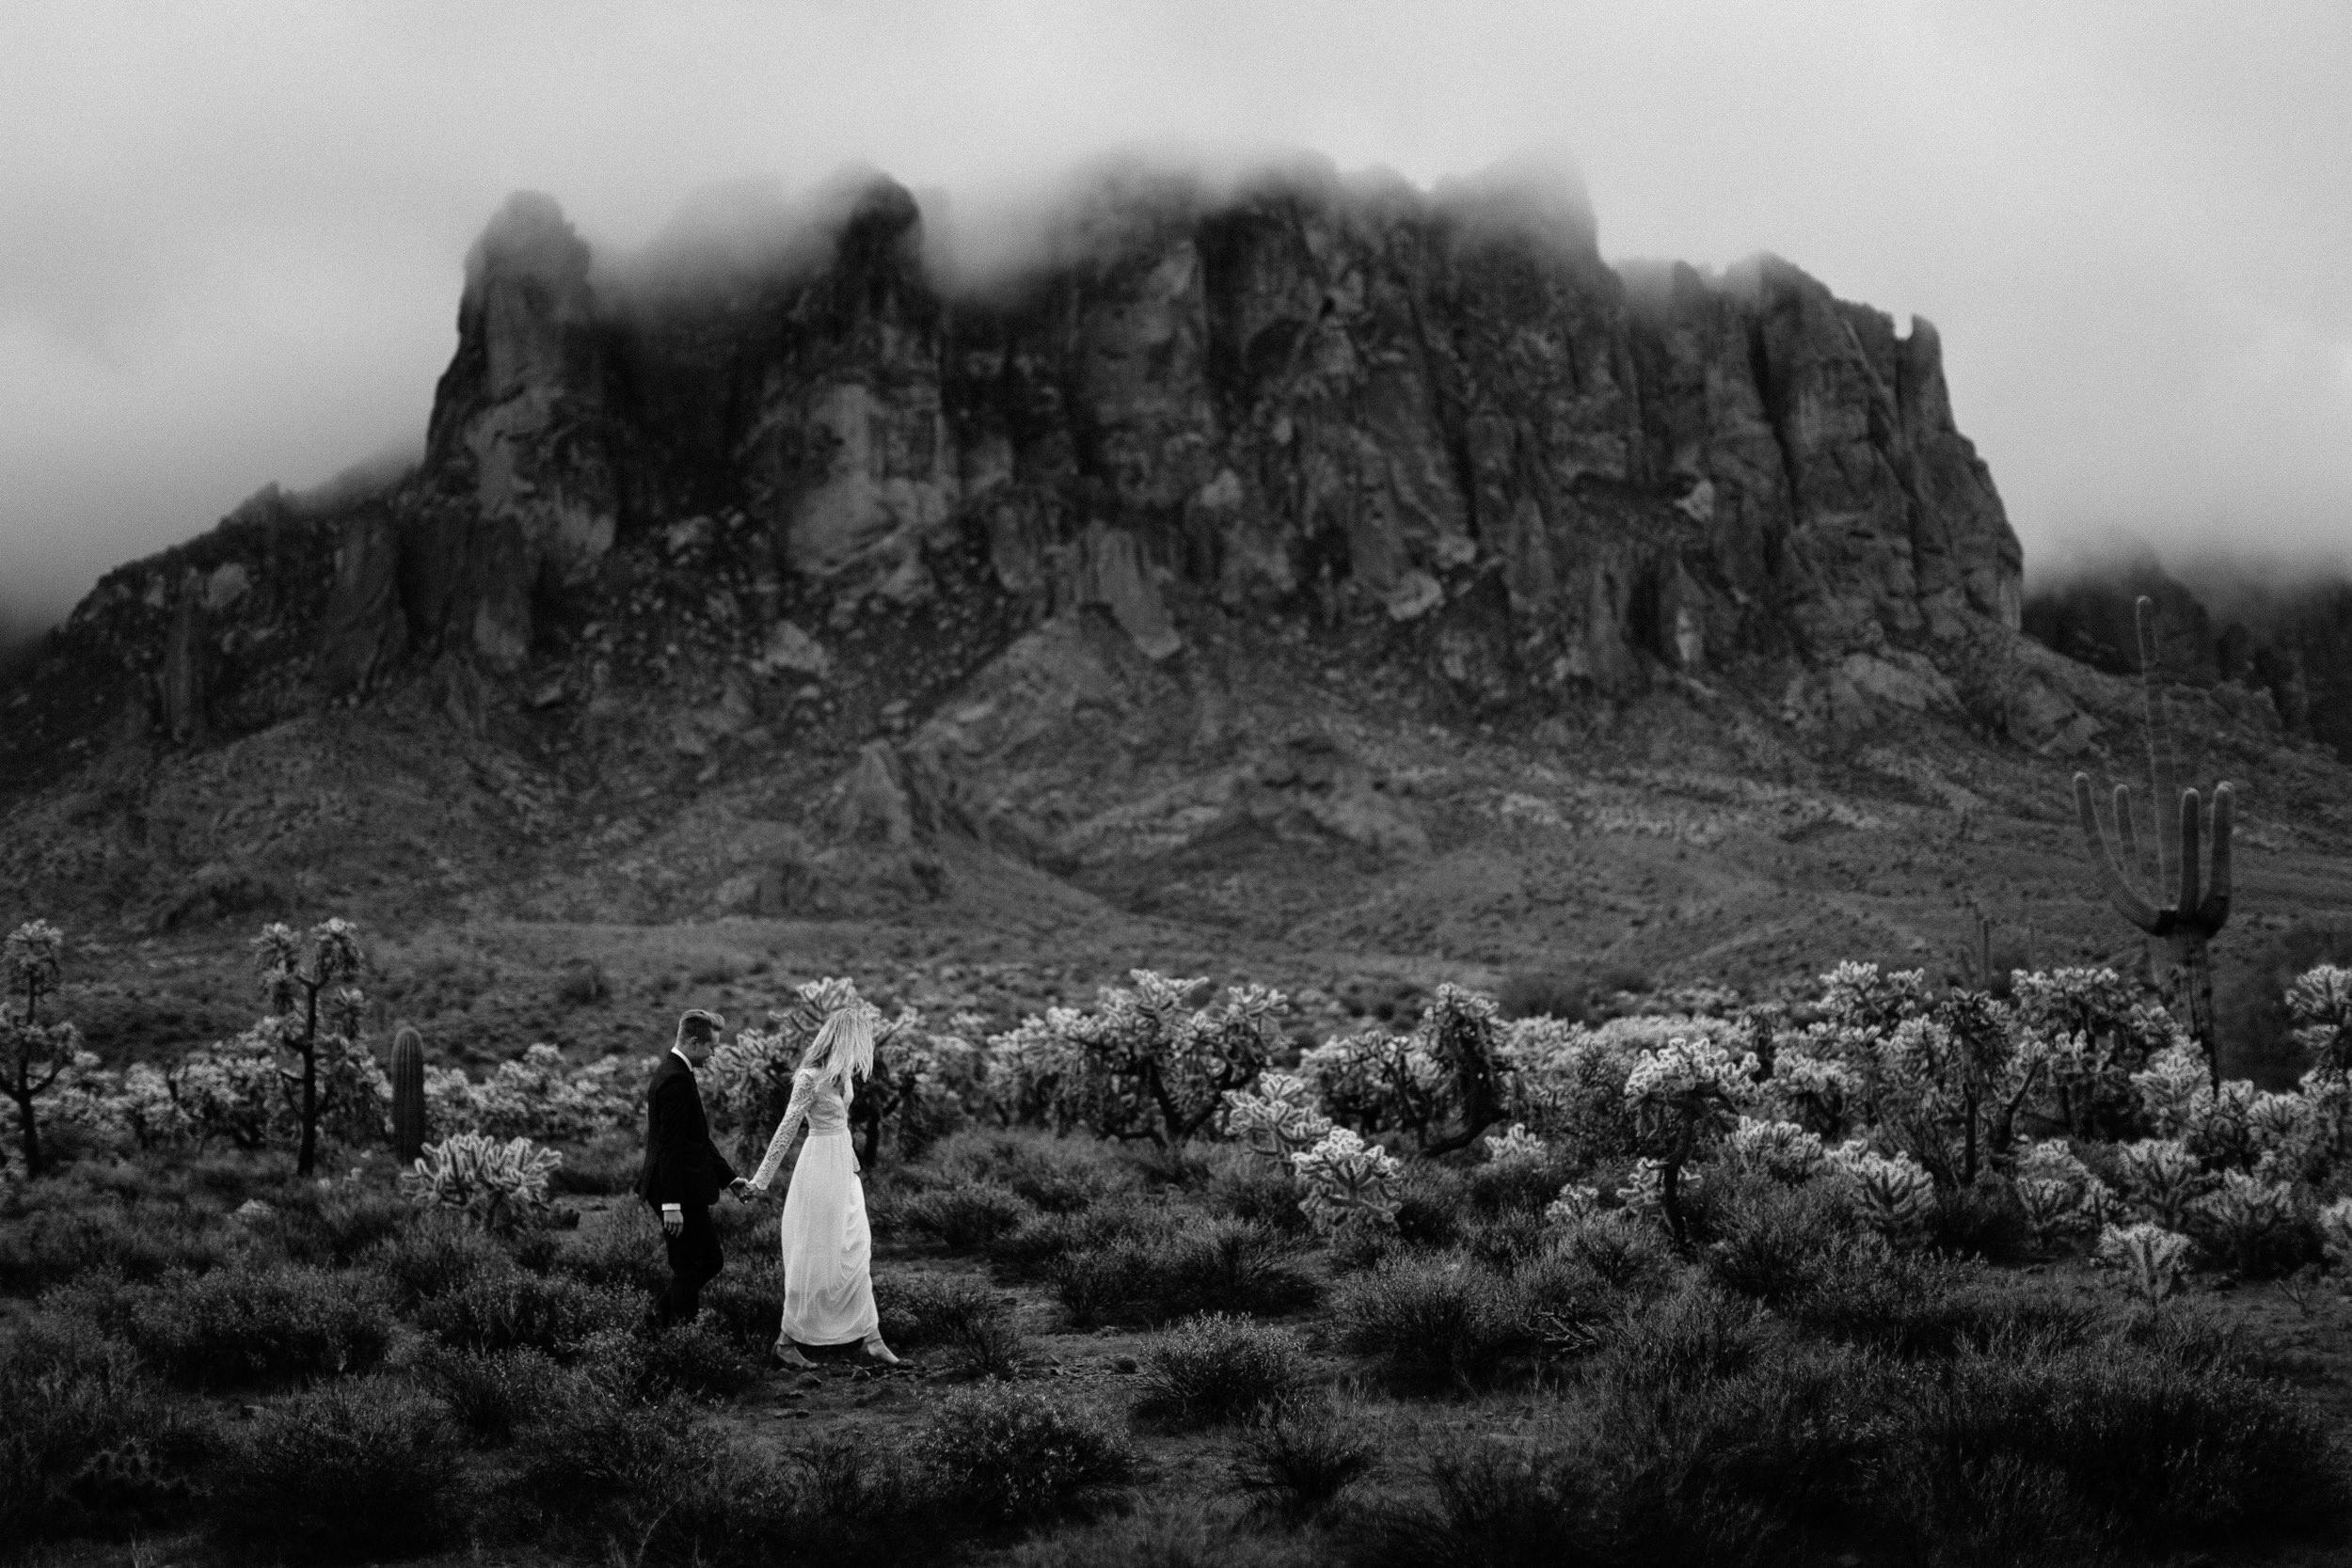 phoenix-mesa-elopement-wedding-photographer-lost-dutchman-state-park-superstitious-mountains-29.jpg